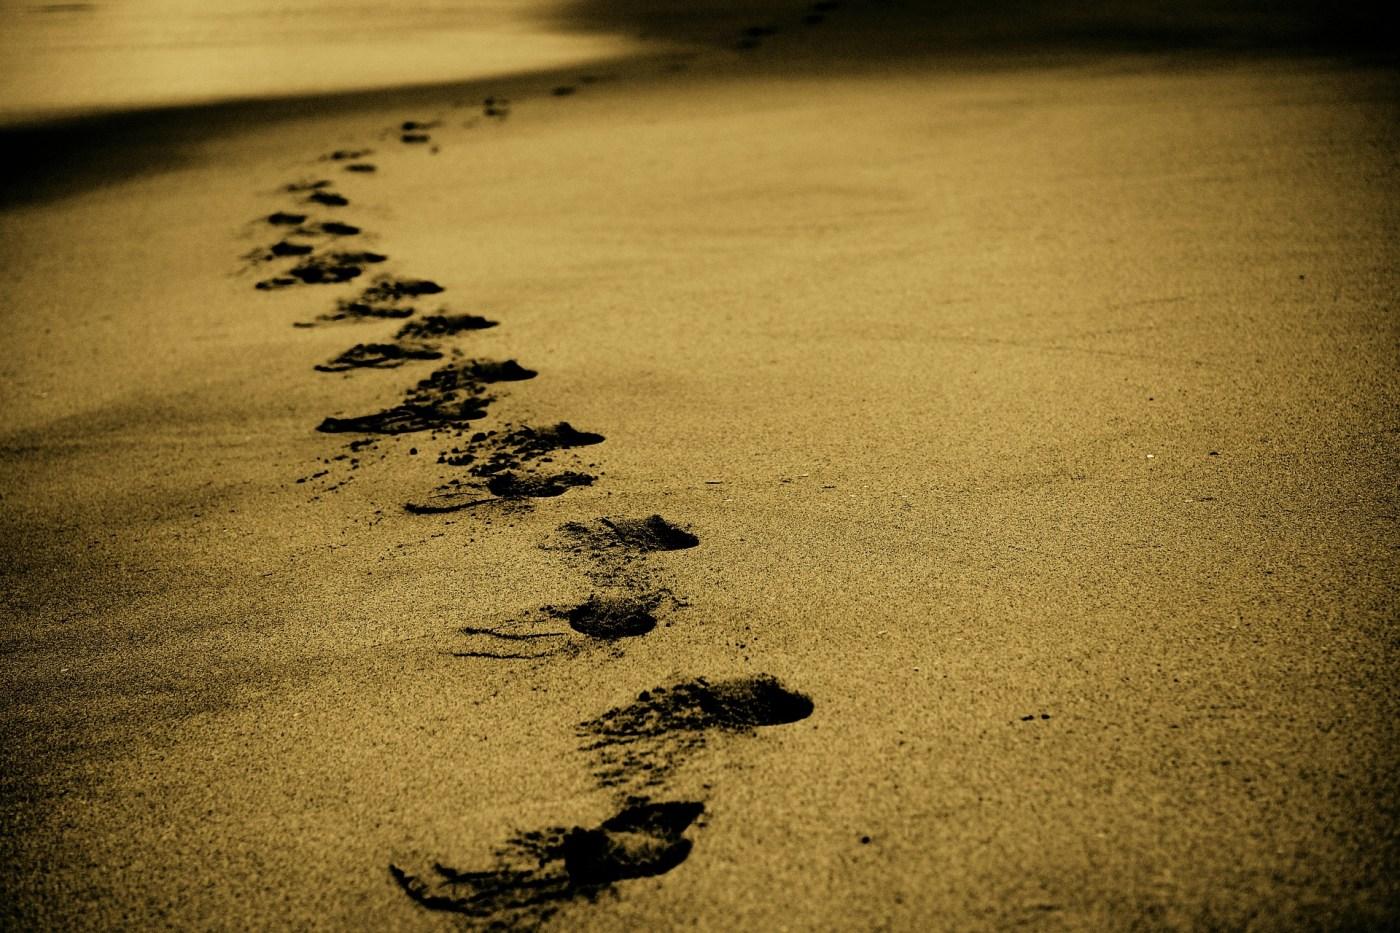 Leave a light footprint